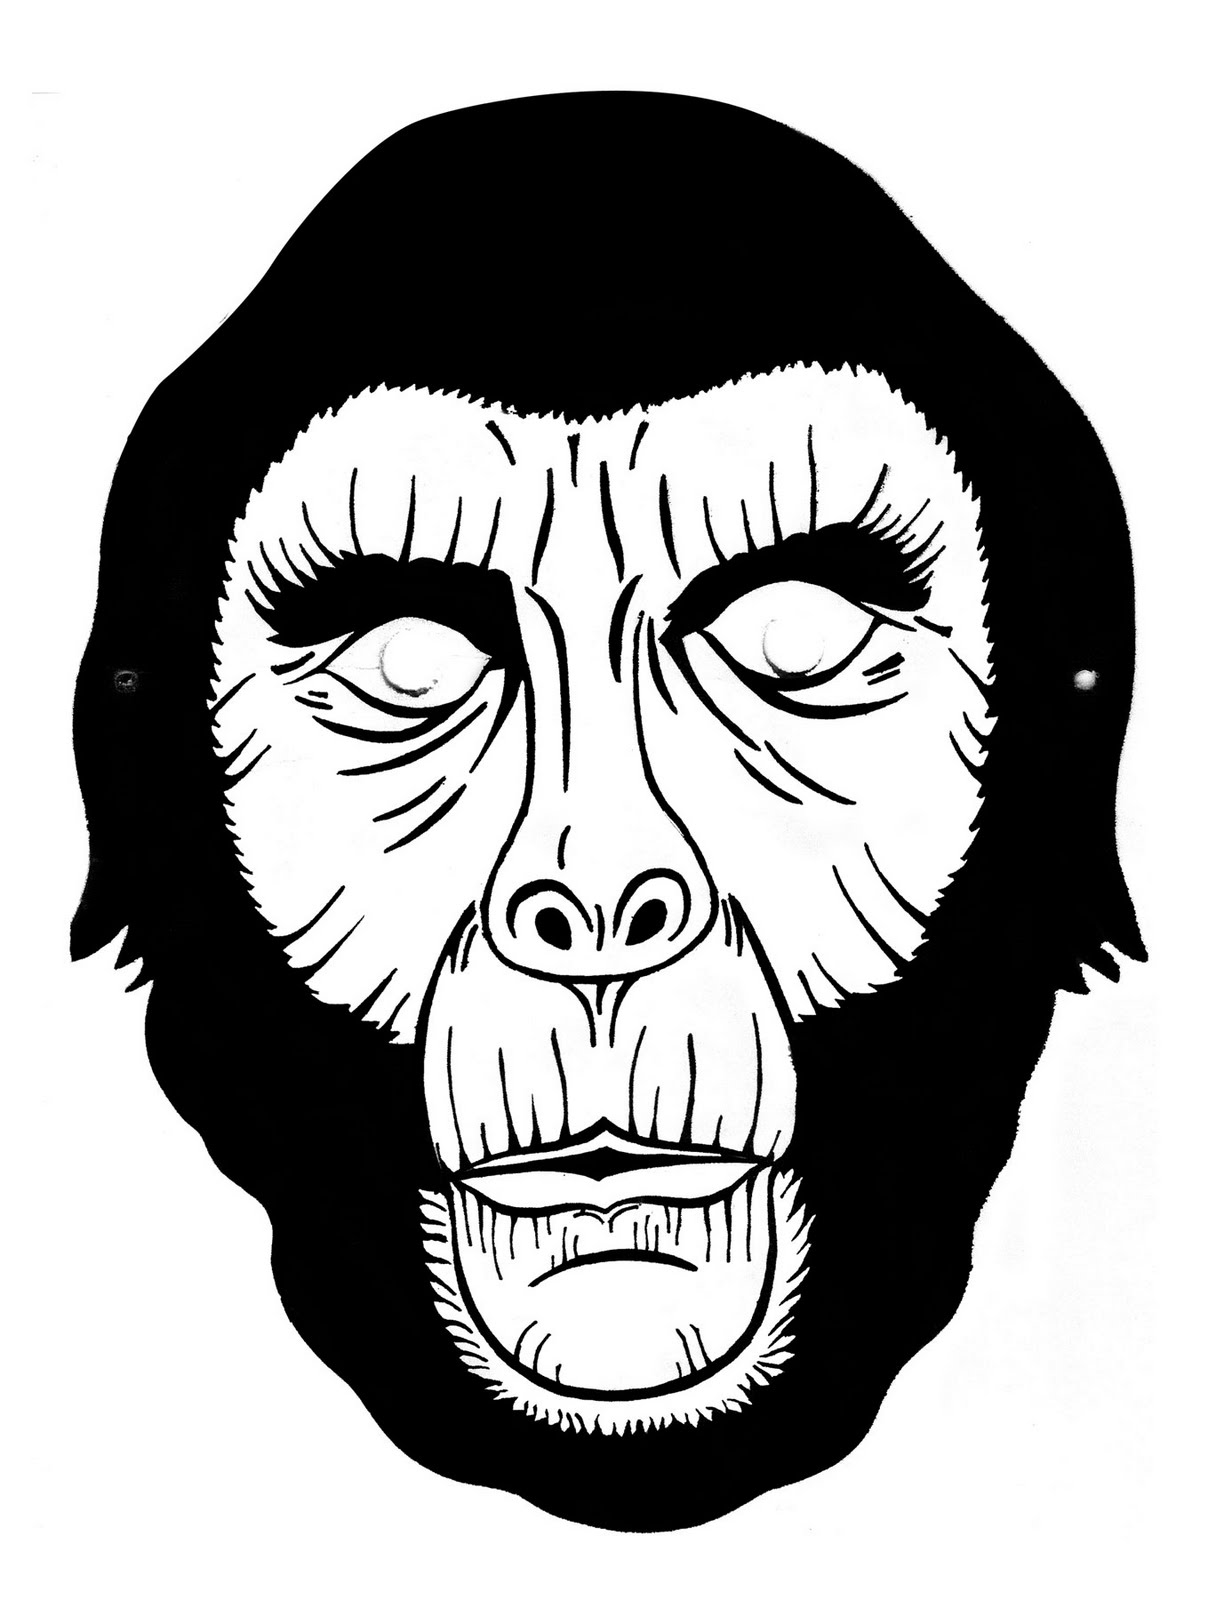 John Rozum.com: 31 Days of Halloween - Day 11 - Mask of the Day